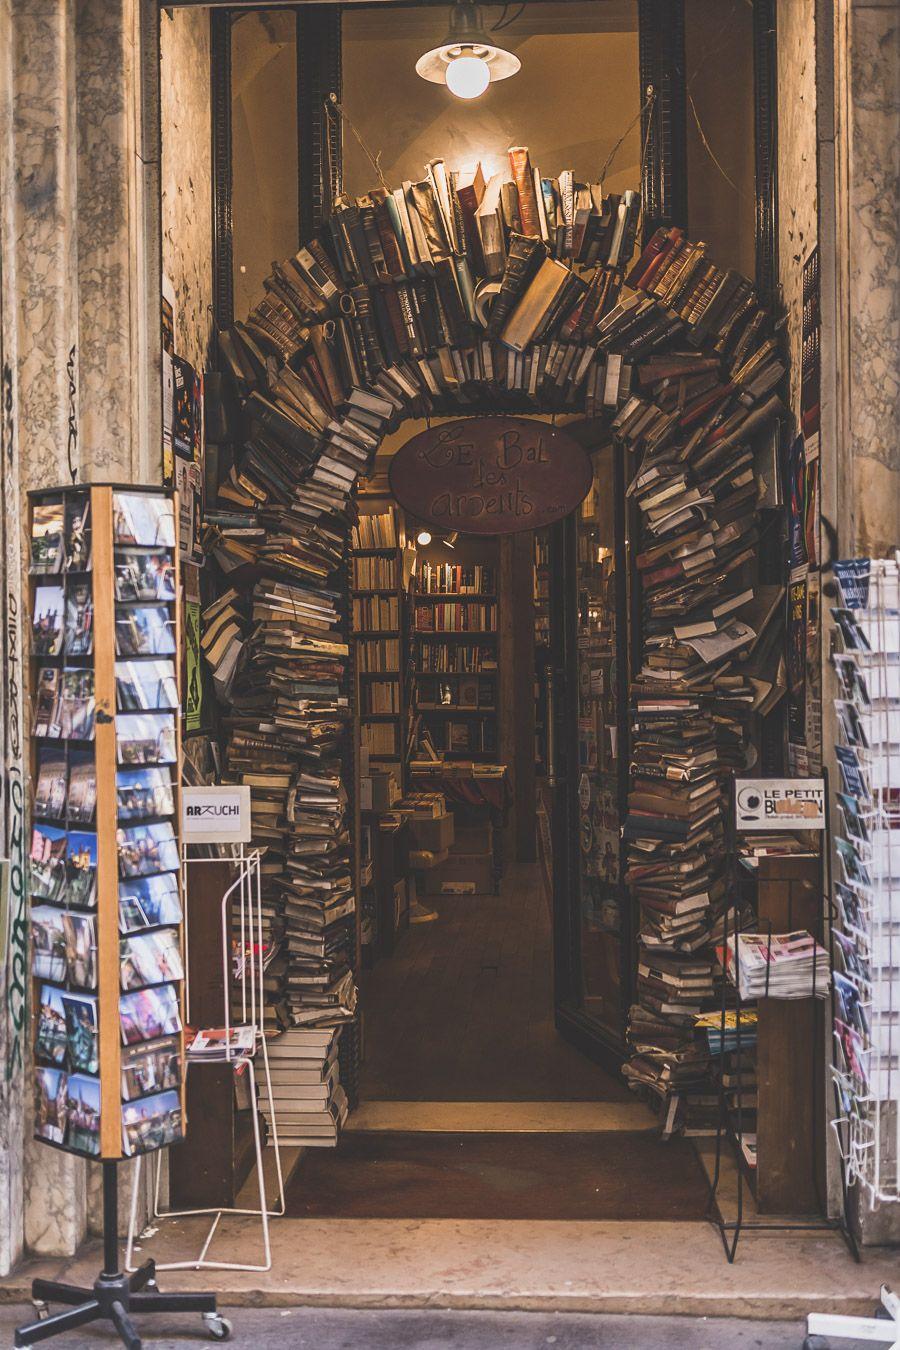 Librairie Le Bal des Ardents